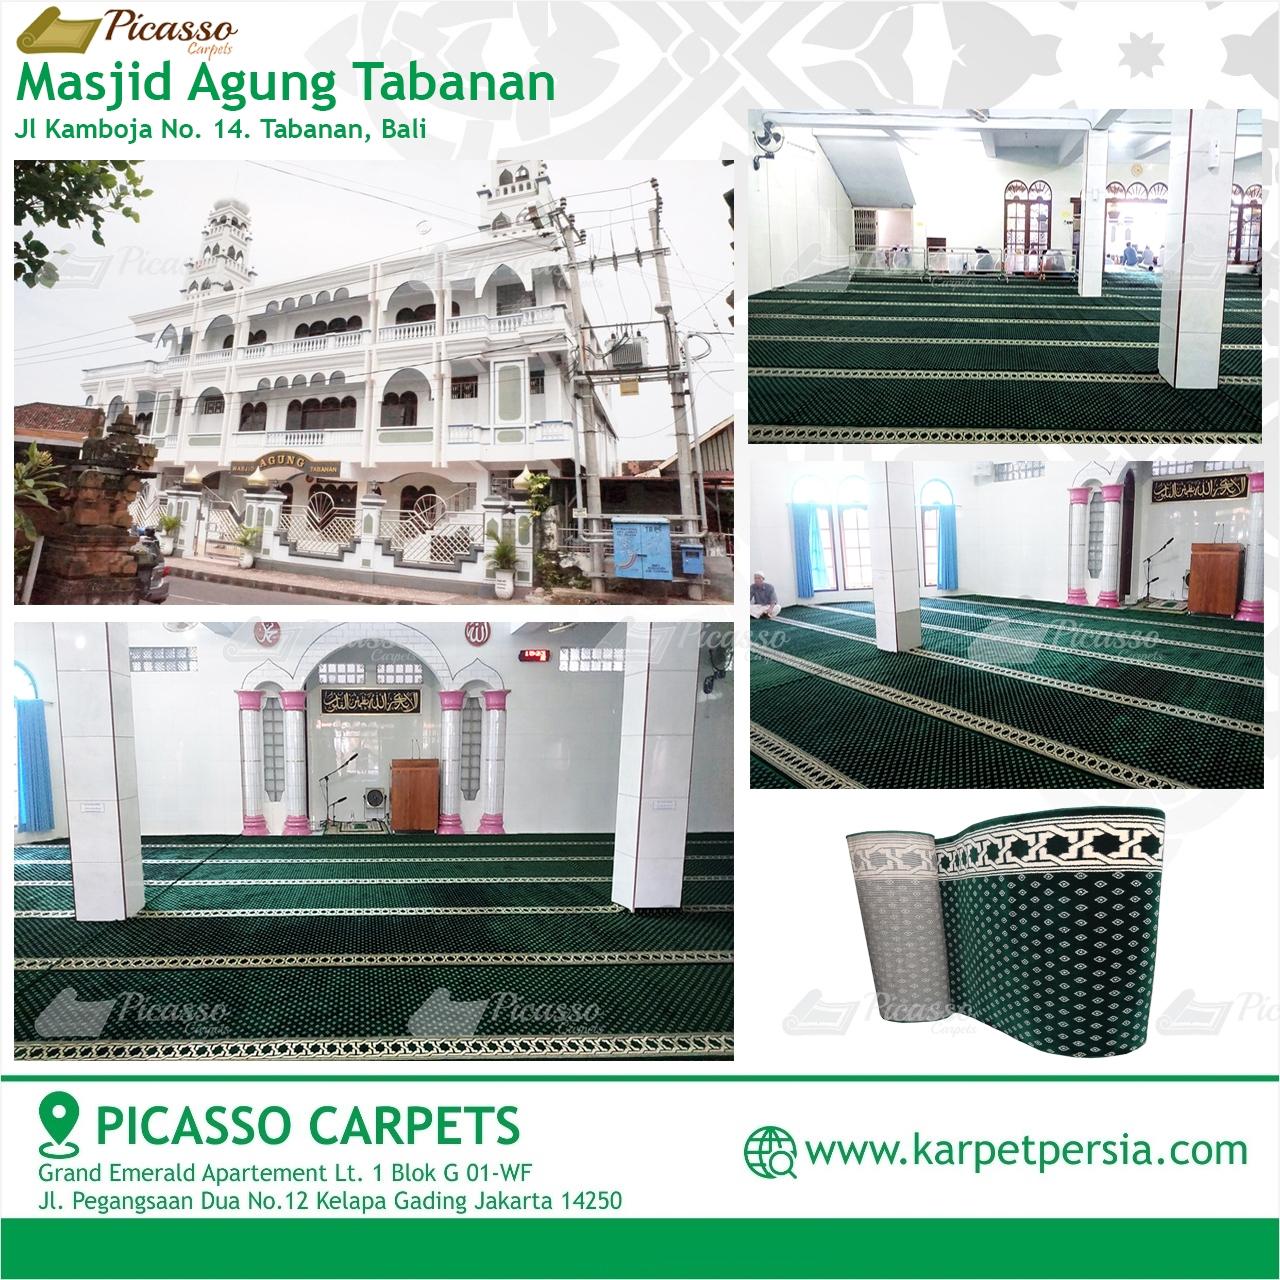 Masjid Agung Tabanan Bali